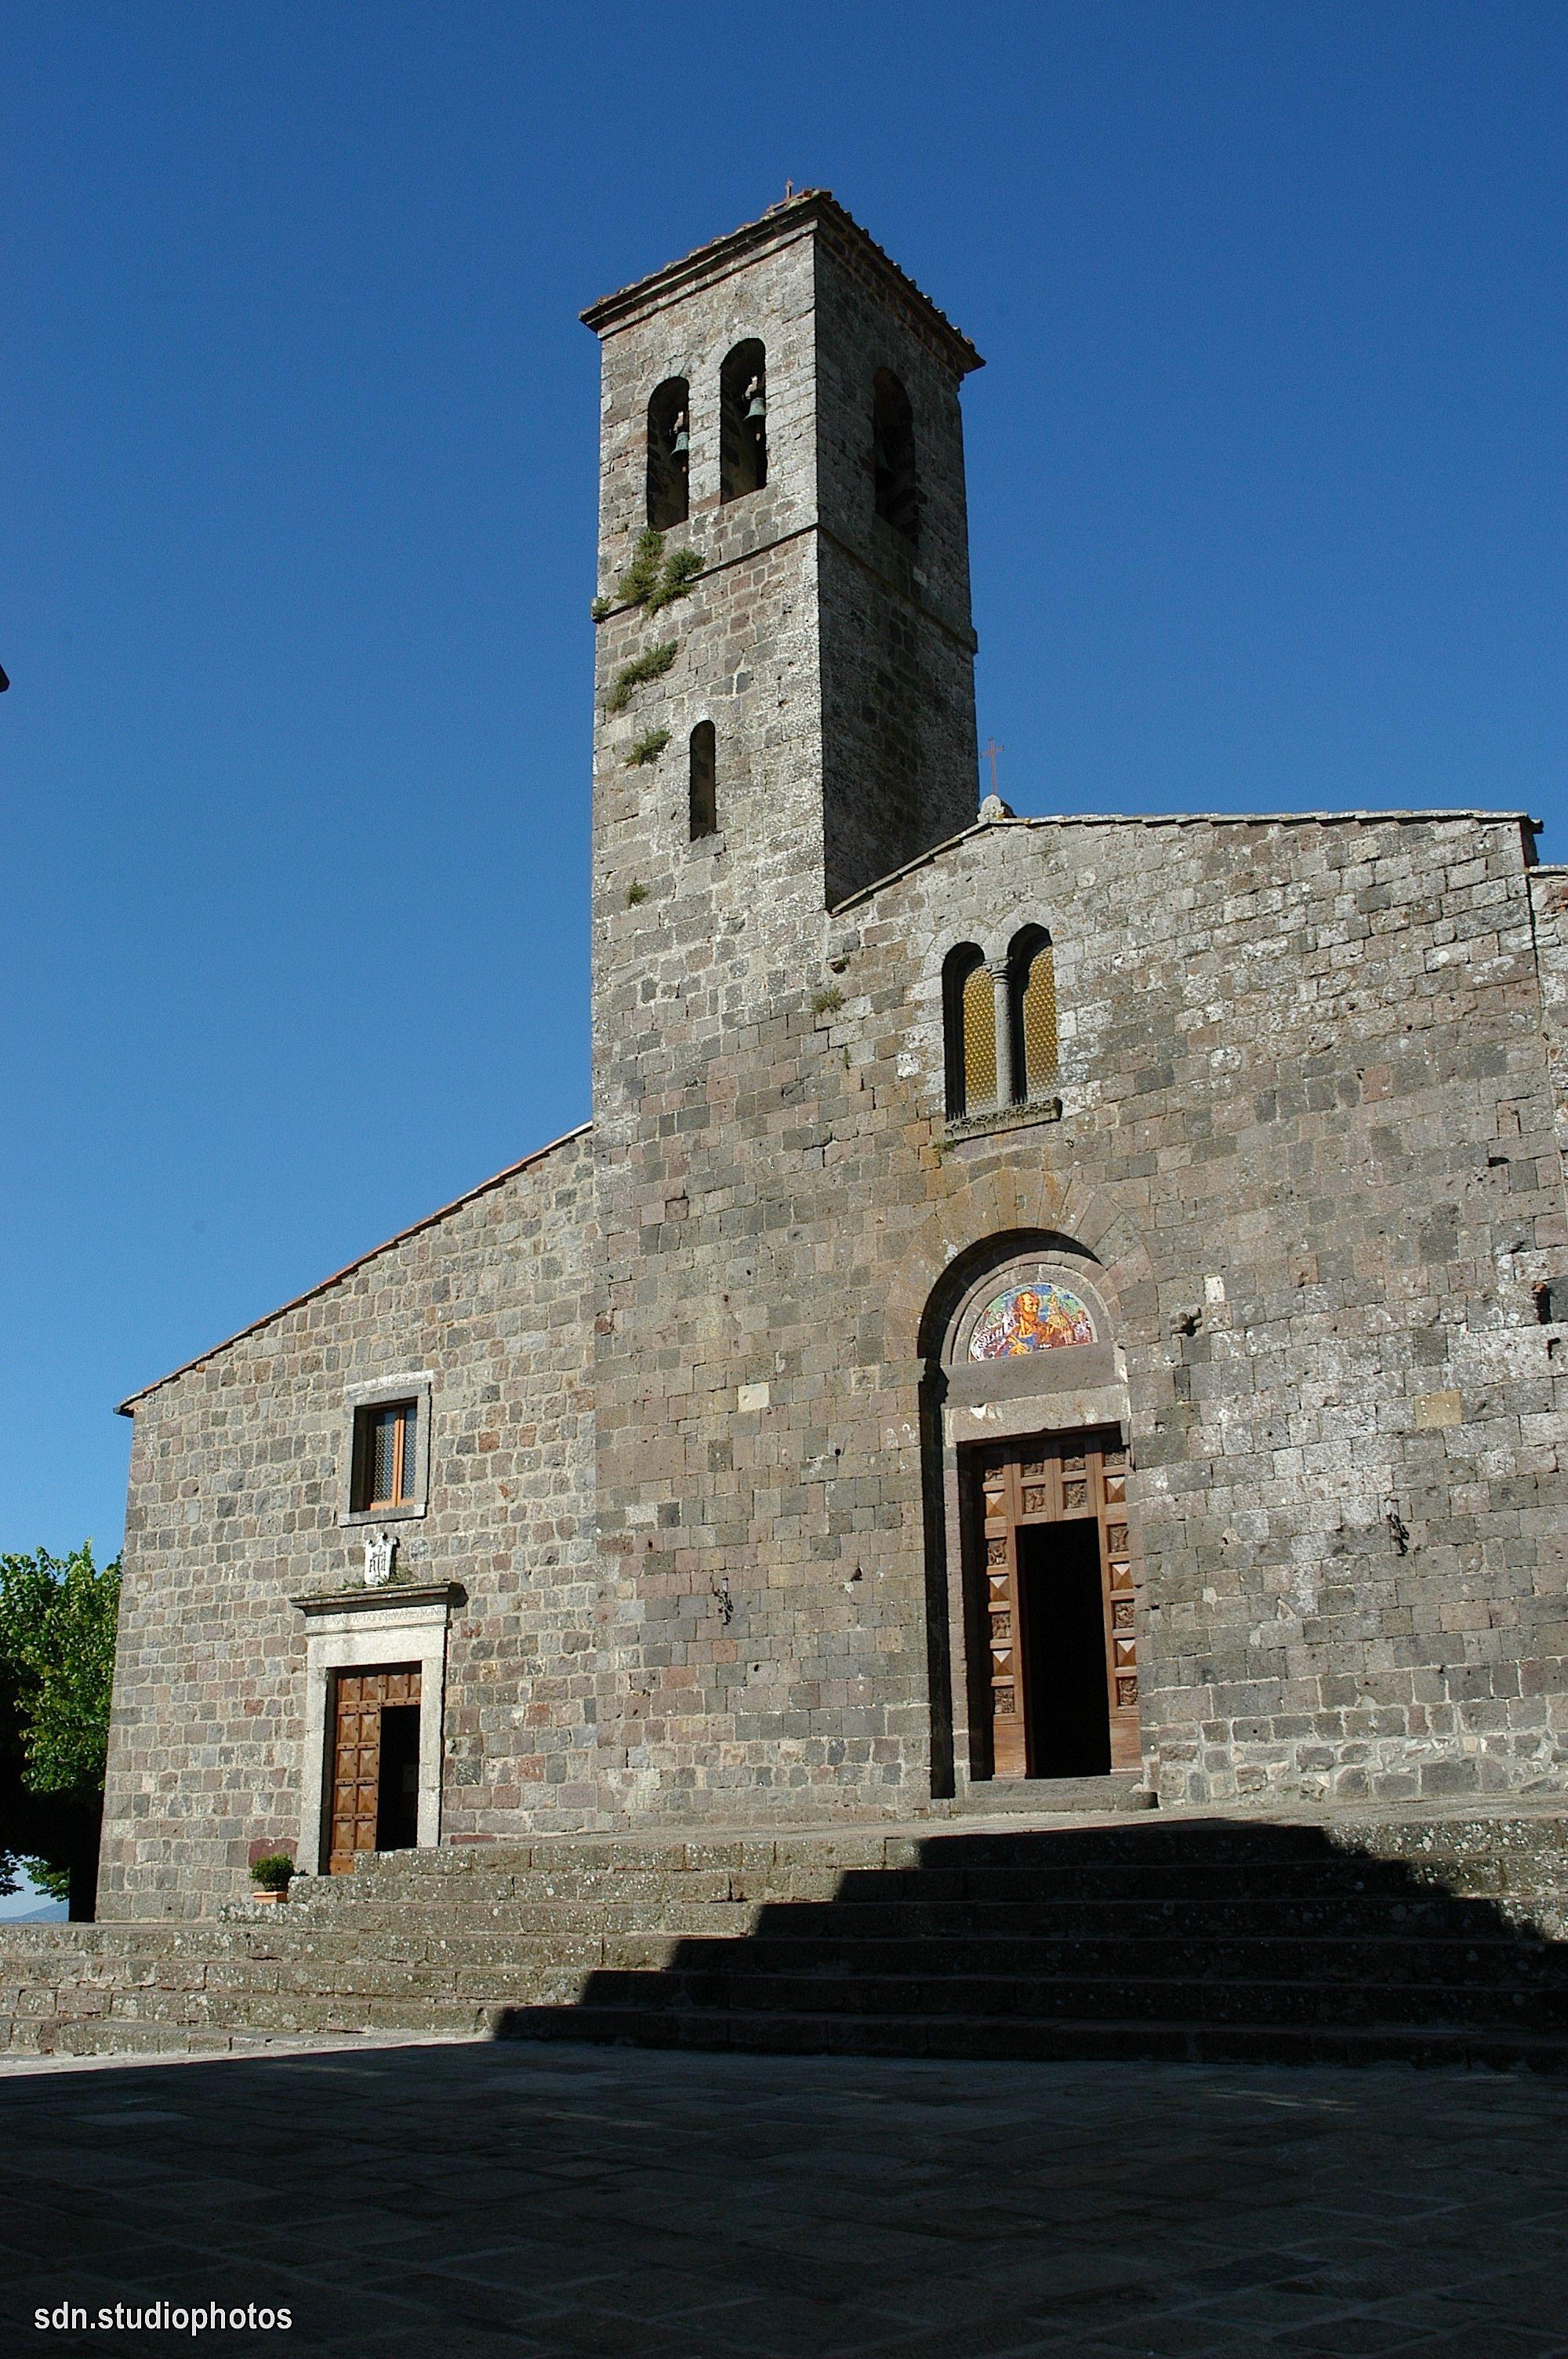 Radicofani (Toscana, Italy) - Chiesa di San Pietro Apostolo